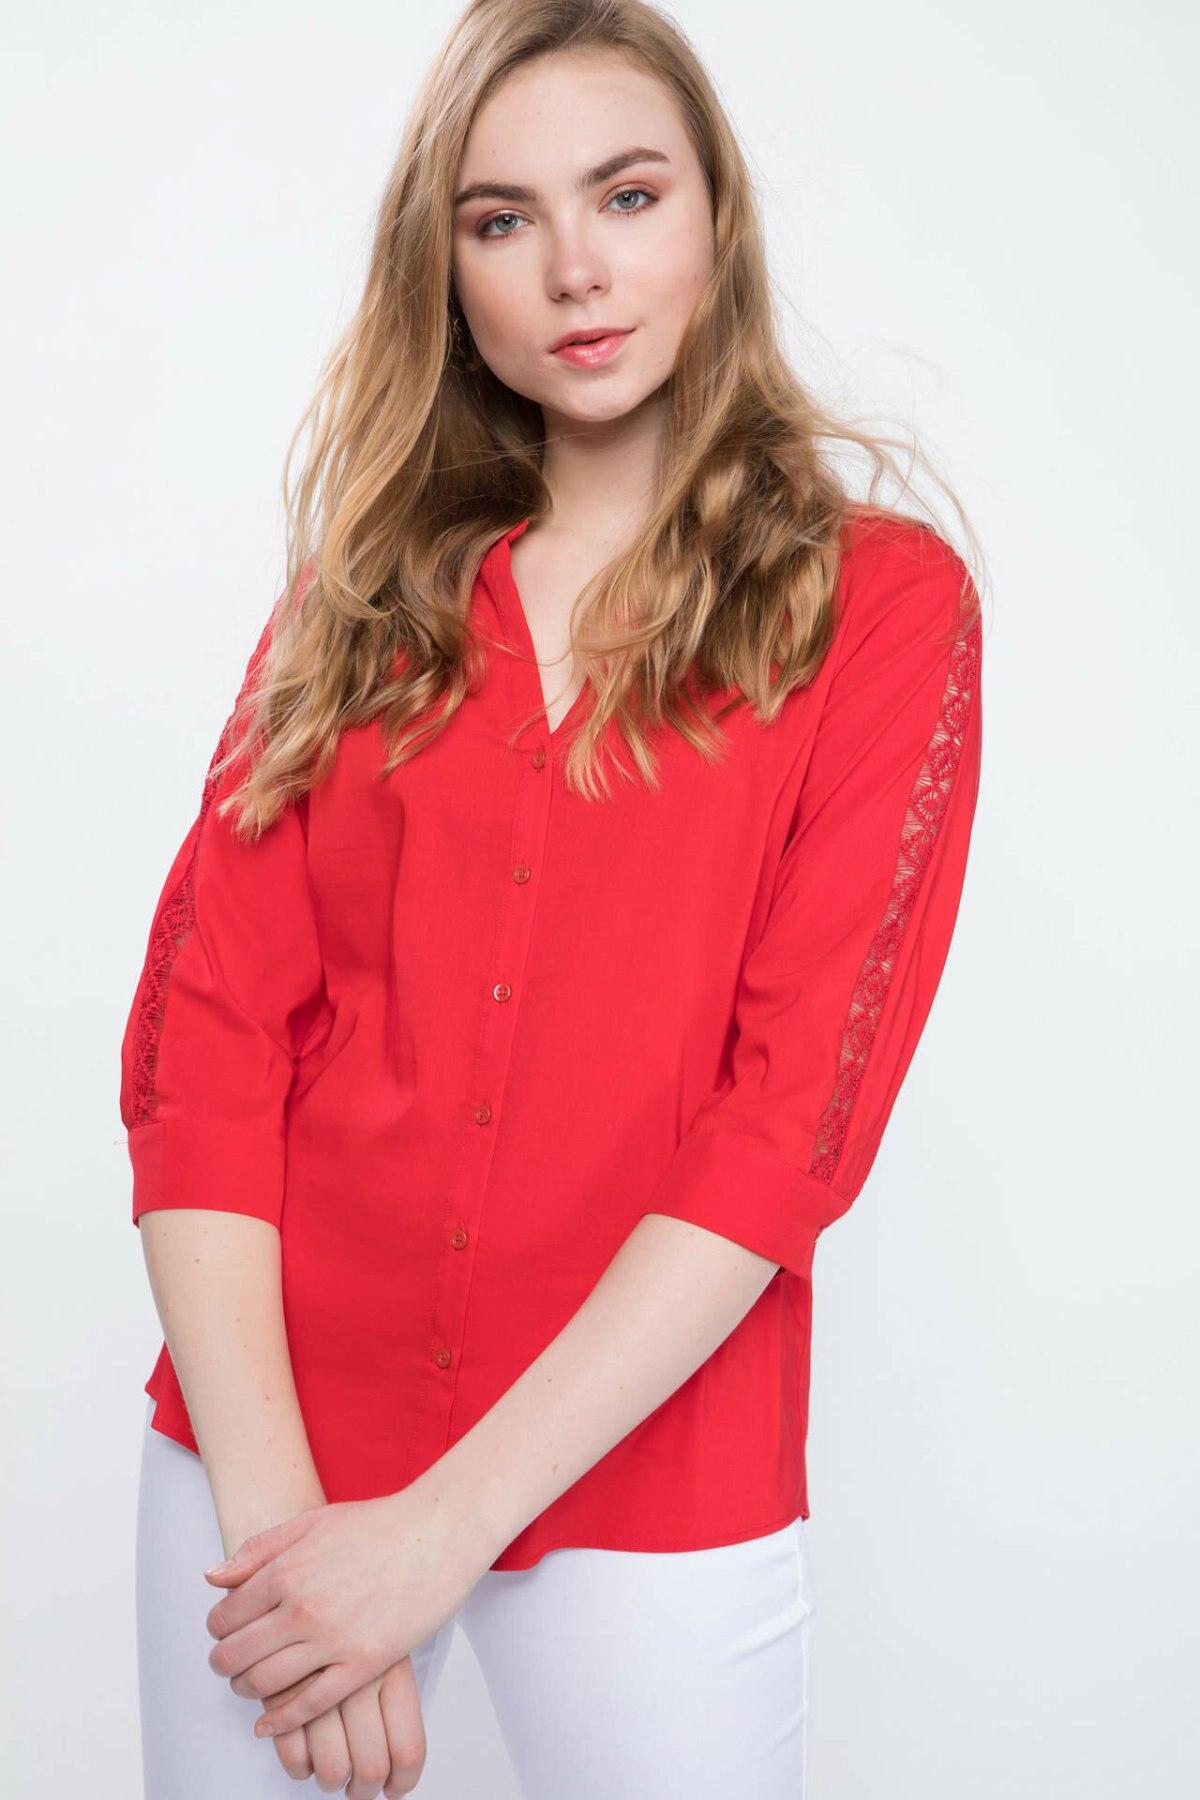 DeFacto Woman Spring Charming Red Shirts Women Casual V-neck Top Shirts Female Long Sleeve Shirt-J9489AZ19SP